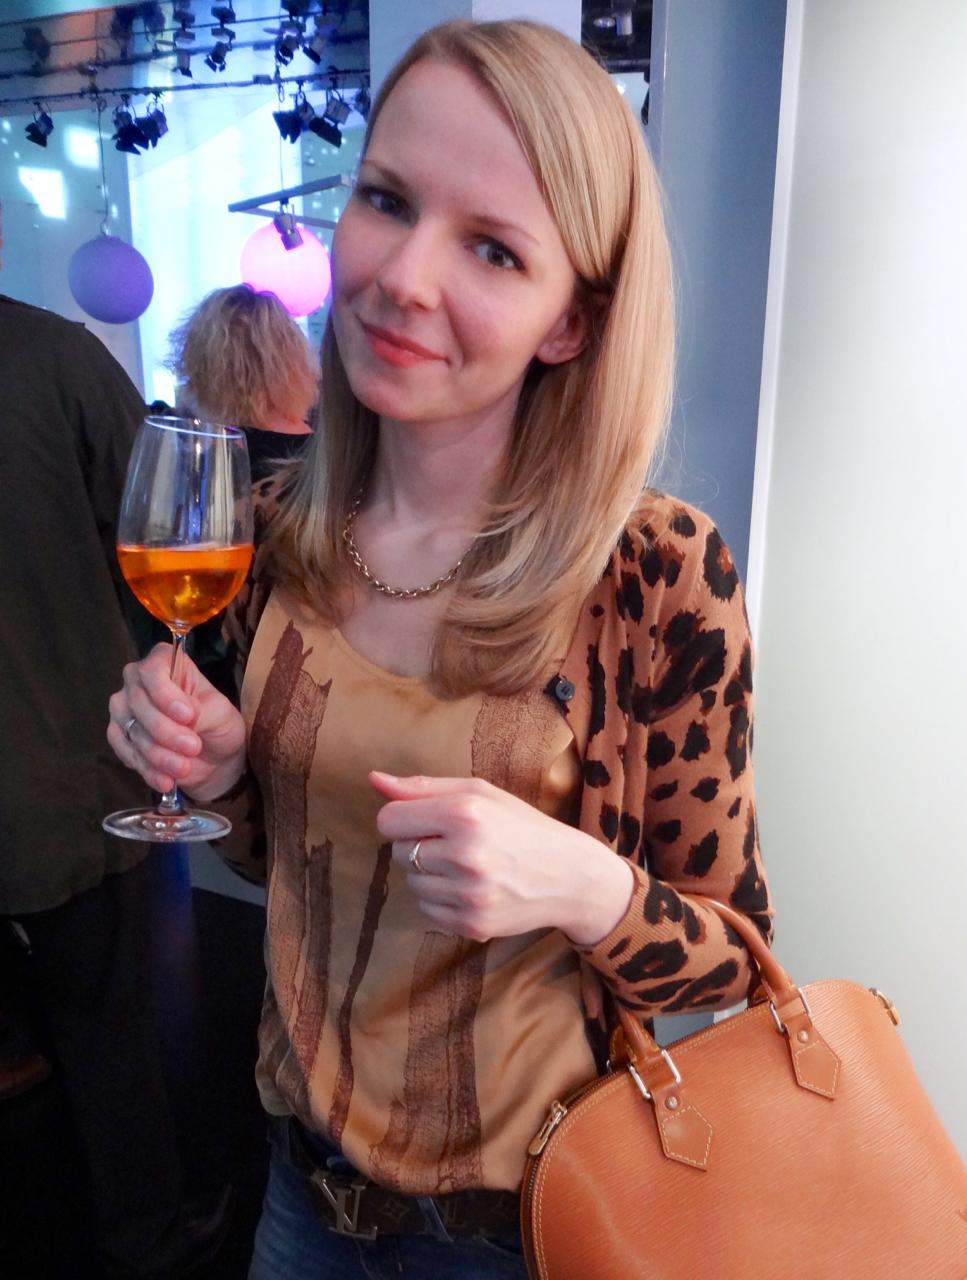 Schnipp Schnapp Haare ab Jennifer PepperAndGold Friseur Hairstylist München Lipperts L2 LippertsFrisuere Lifestyle Beauty